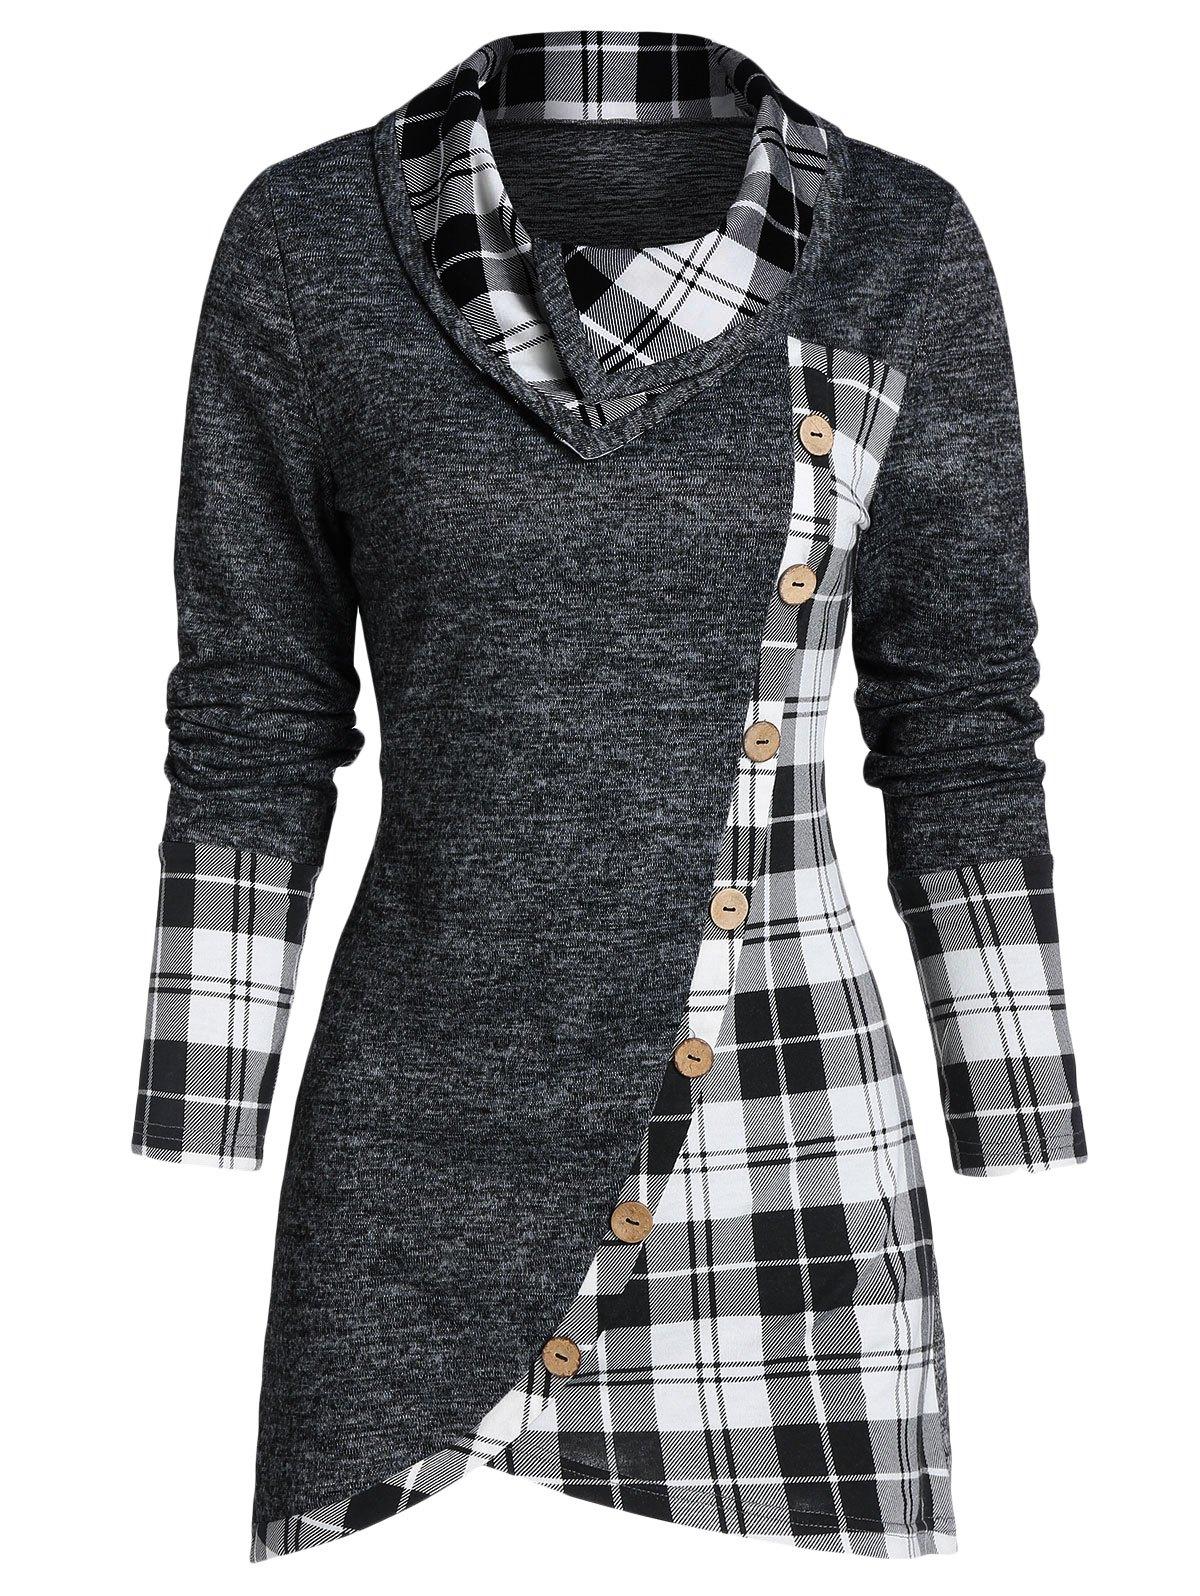 Plaid Print Mock Button Overlap Tunic T-shirt